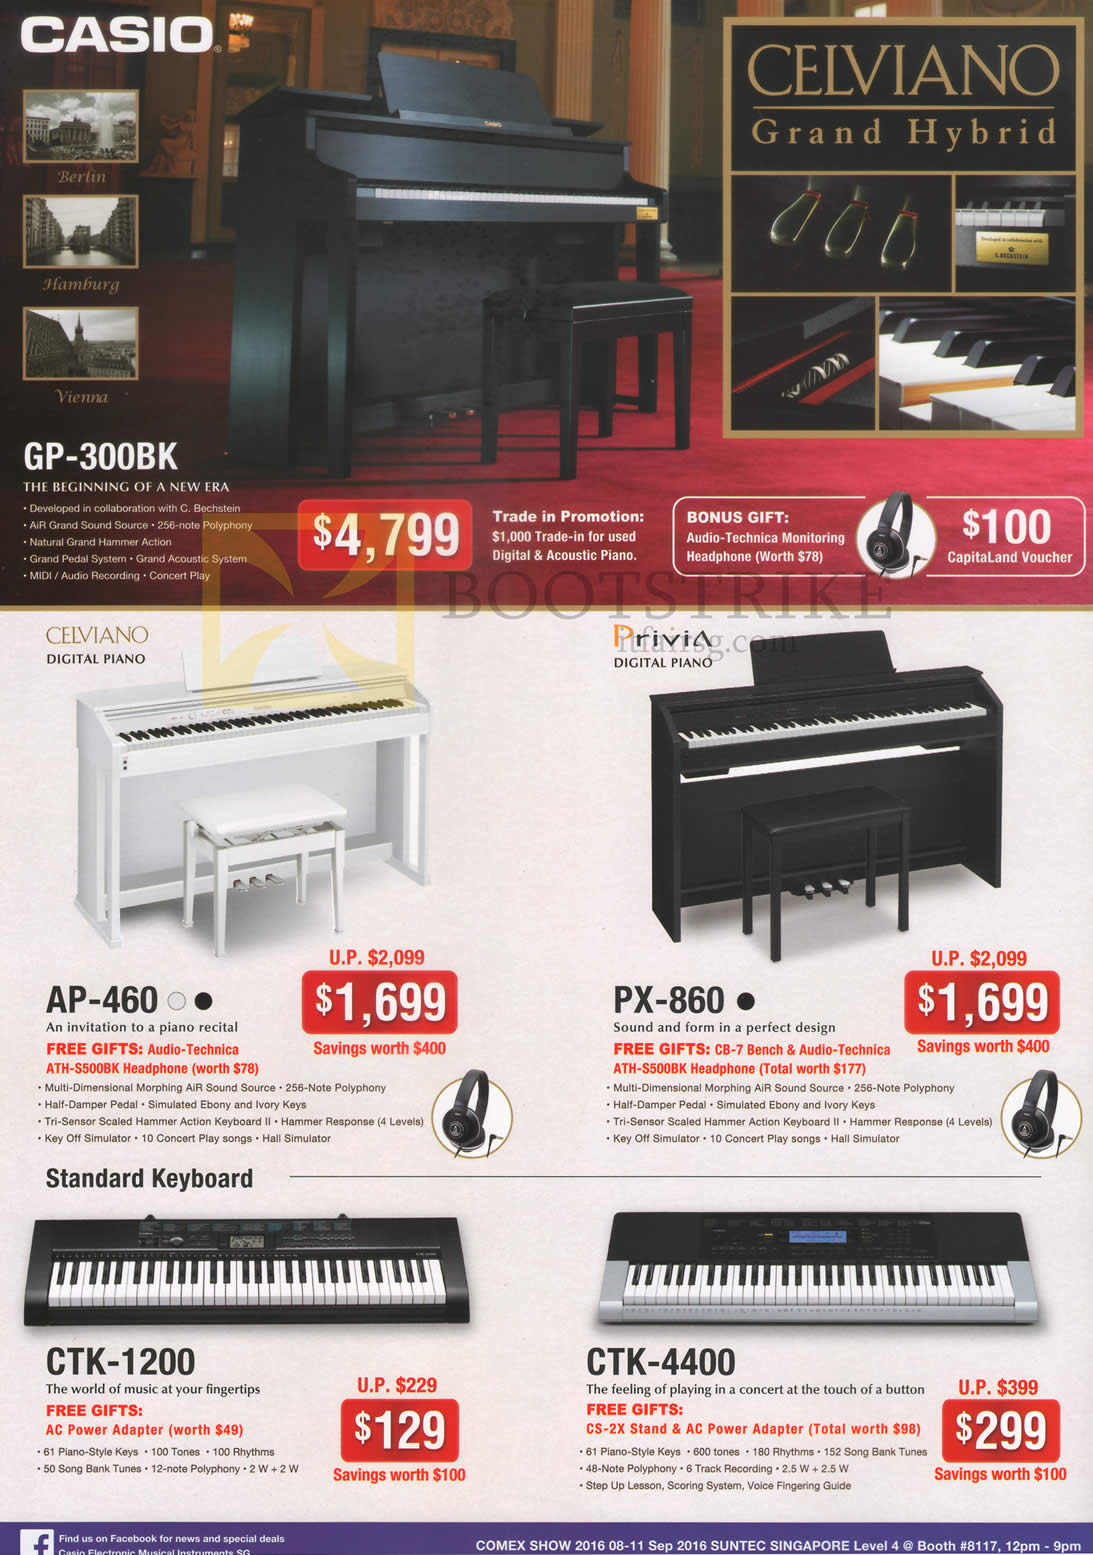 COMEX 2016 price list image brochure of Casio Keyboards GP-300BK, AP-460, PX-860, CTK-1200, CTK-4400